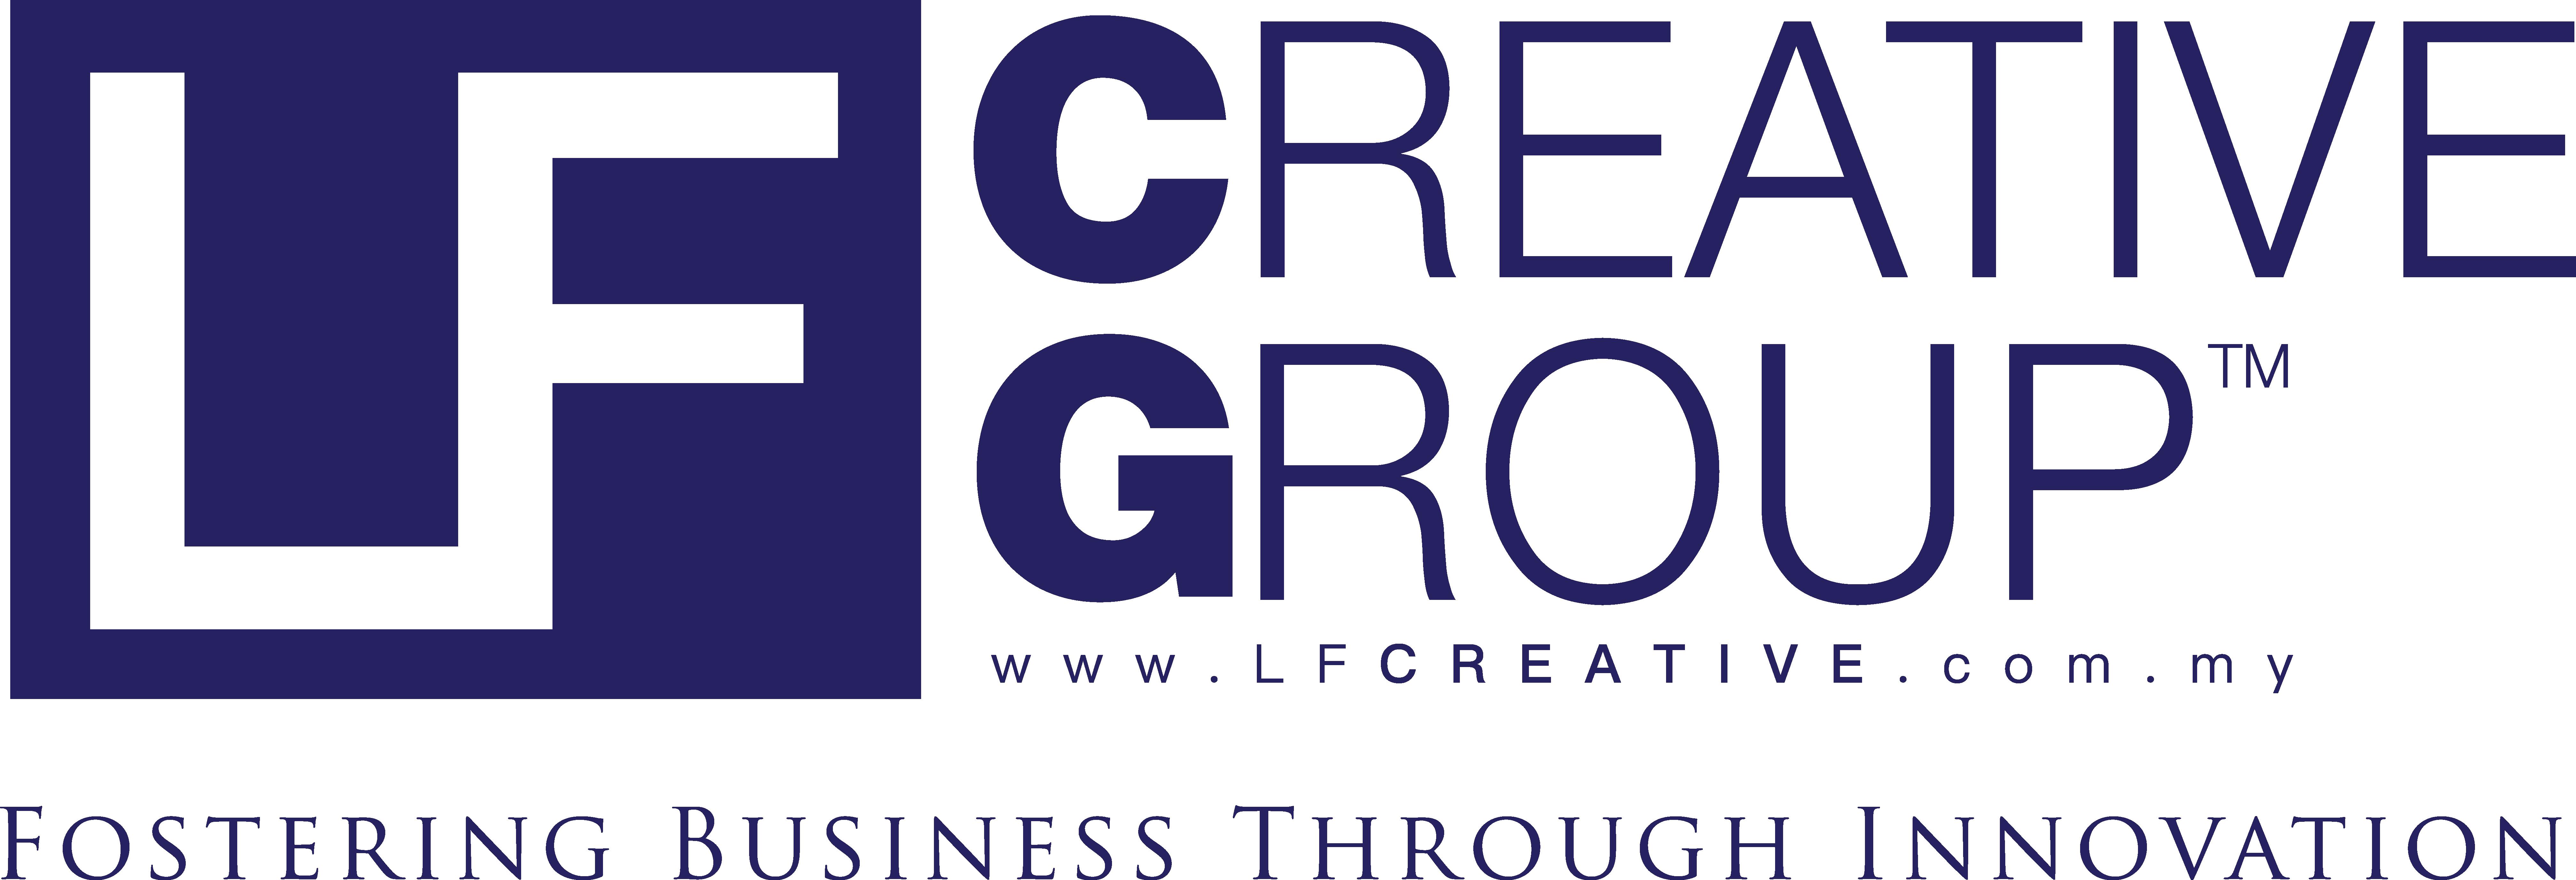 LFCreativeGroup